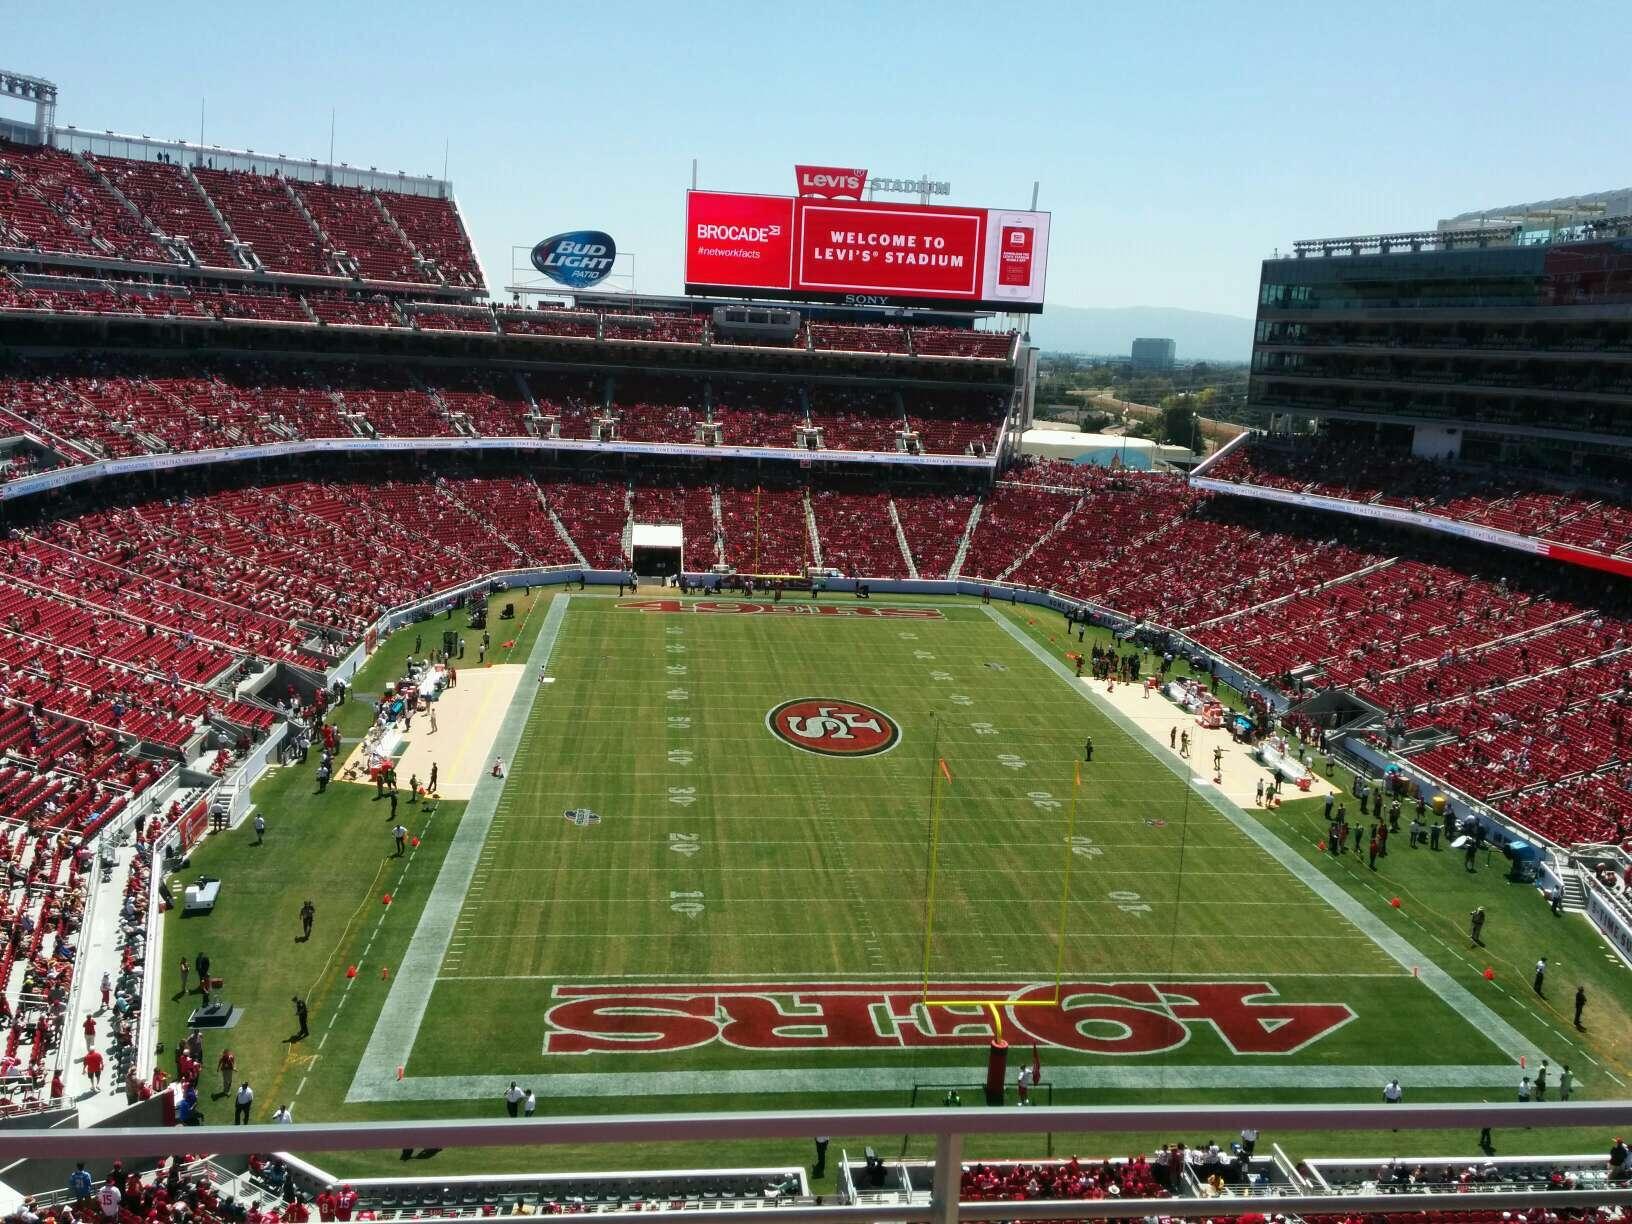 Levi S Stadium Section 304 Row 2 Seat 13 San Francisco